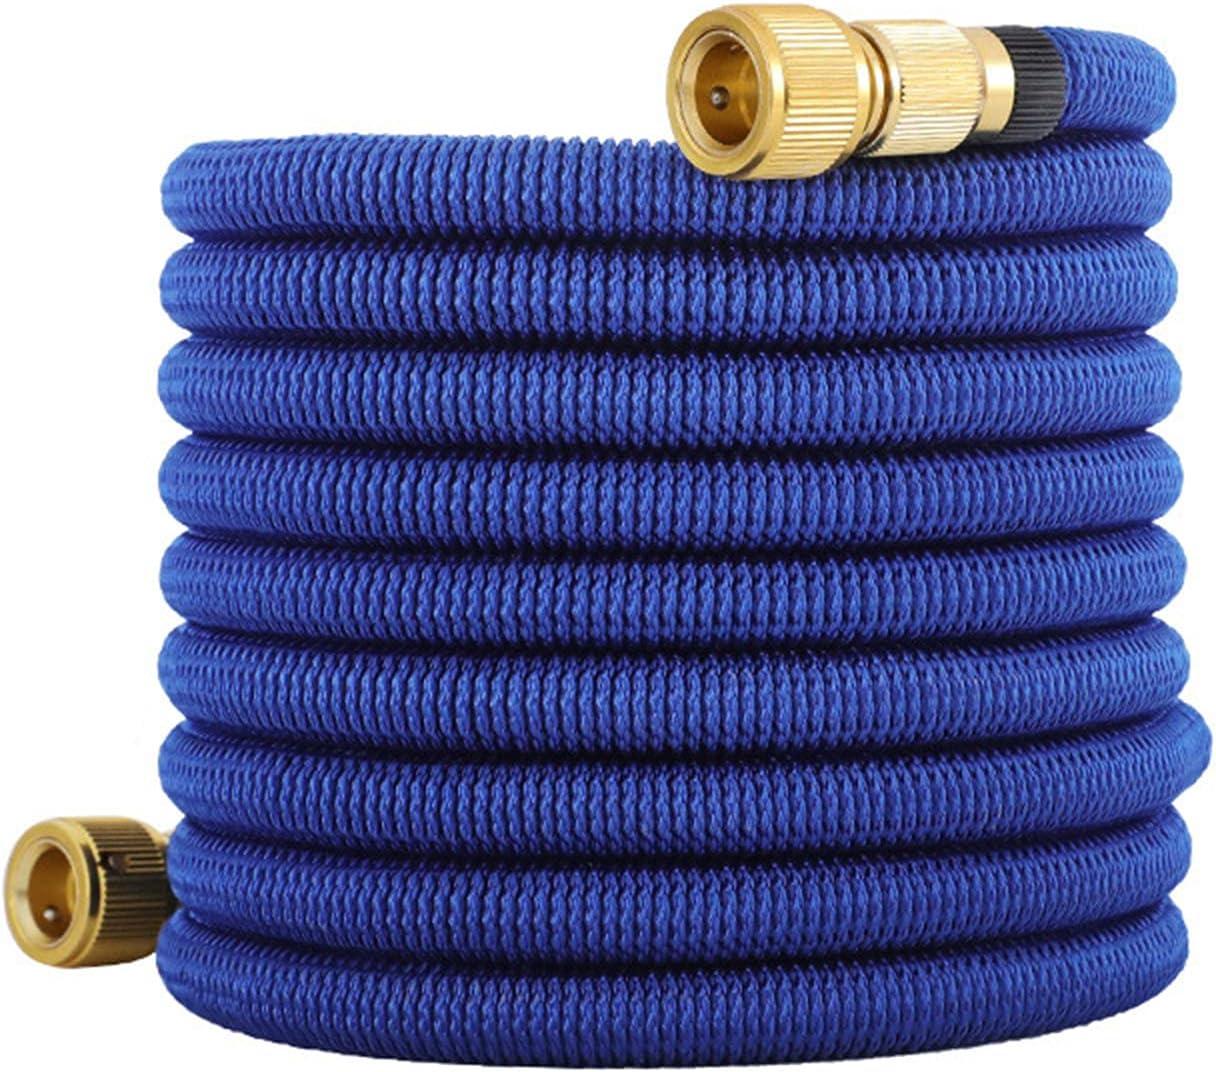 QWESHTU 55% OFF Garden Hose Water Easy-to-use Ho Flexible Expandable Leakproof